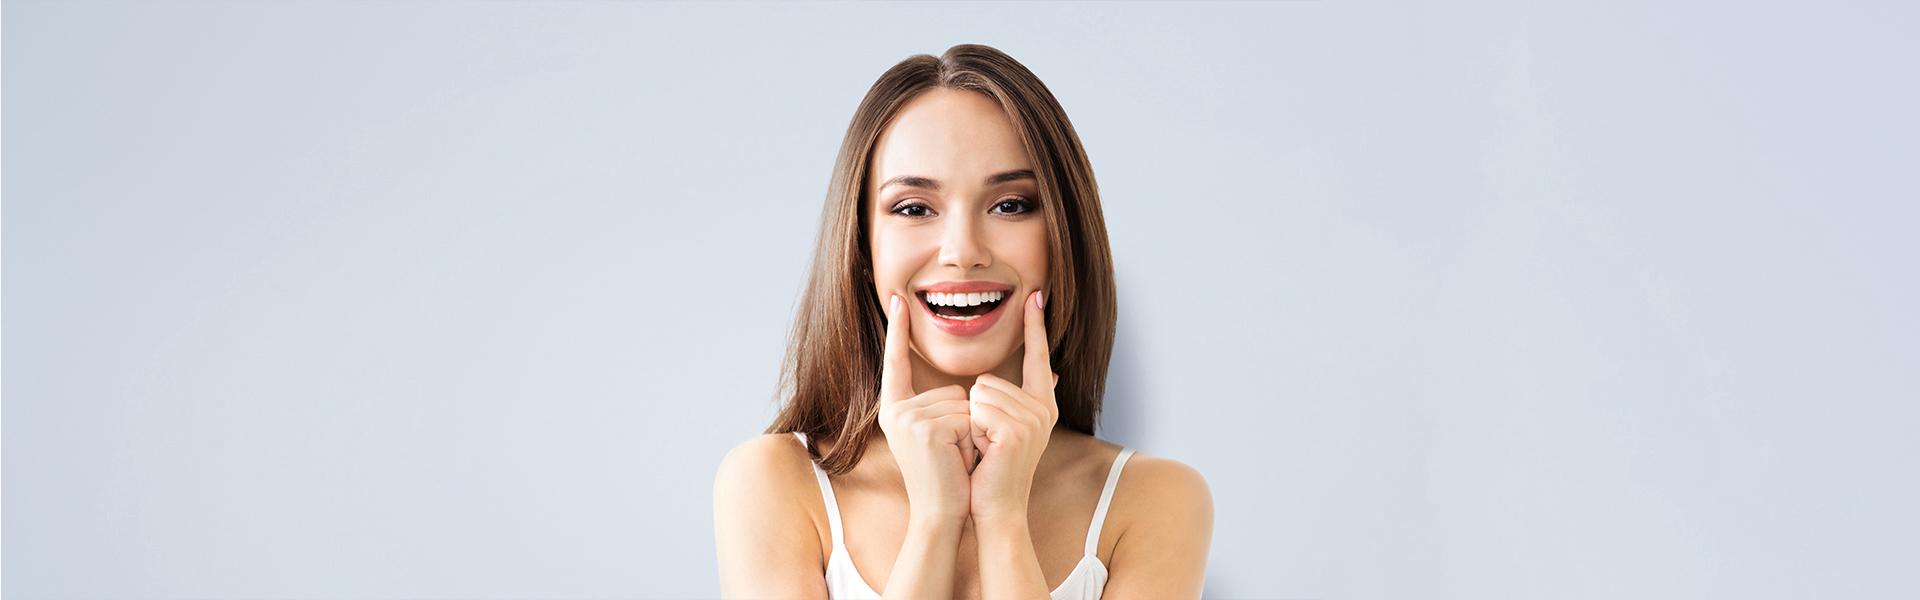 3 Dental Myths You Shouldn't Believe